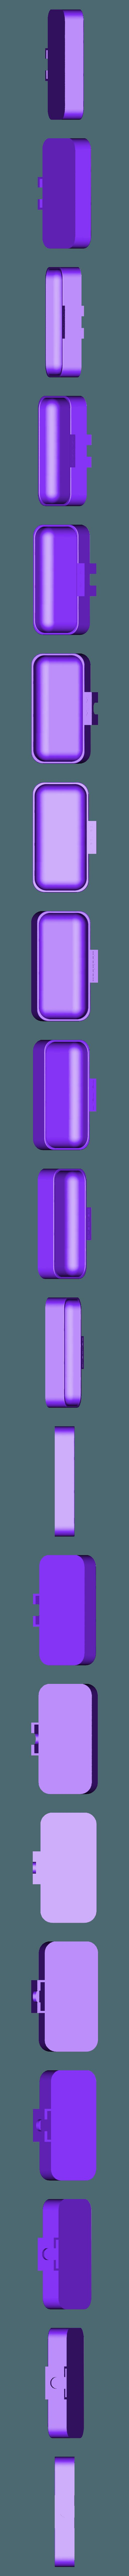 Tools_Tray_iguigui_3.stl Download free STL file Tools tray • Design to 3D print, iguigui